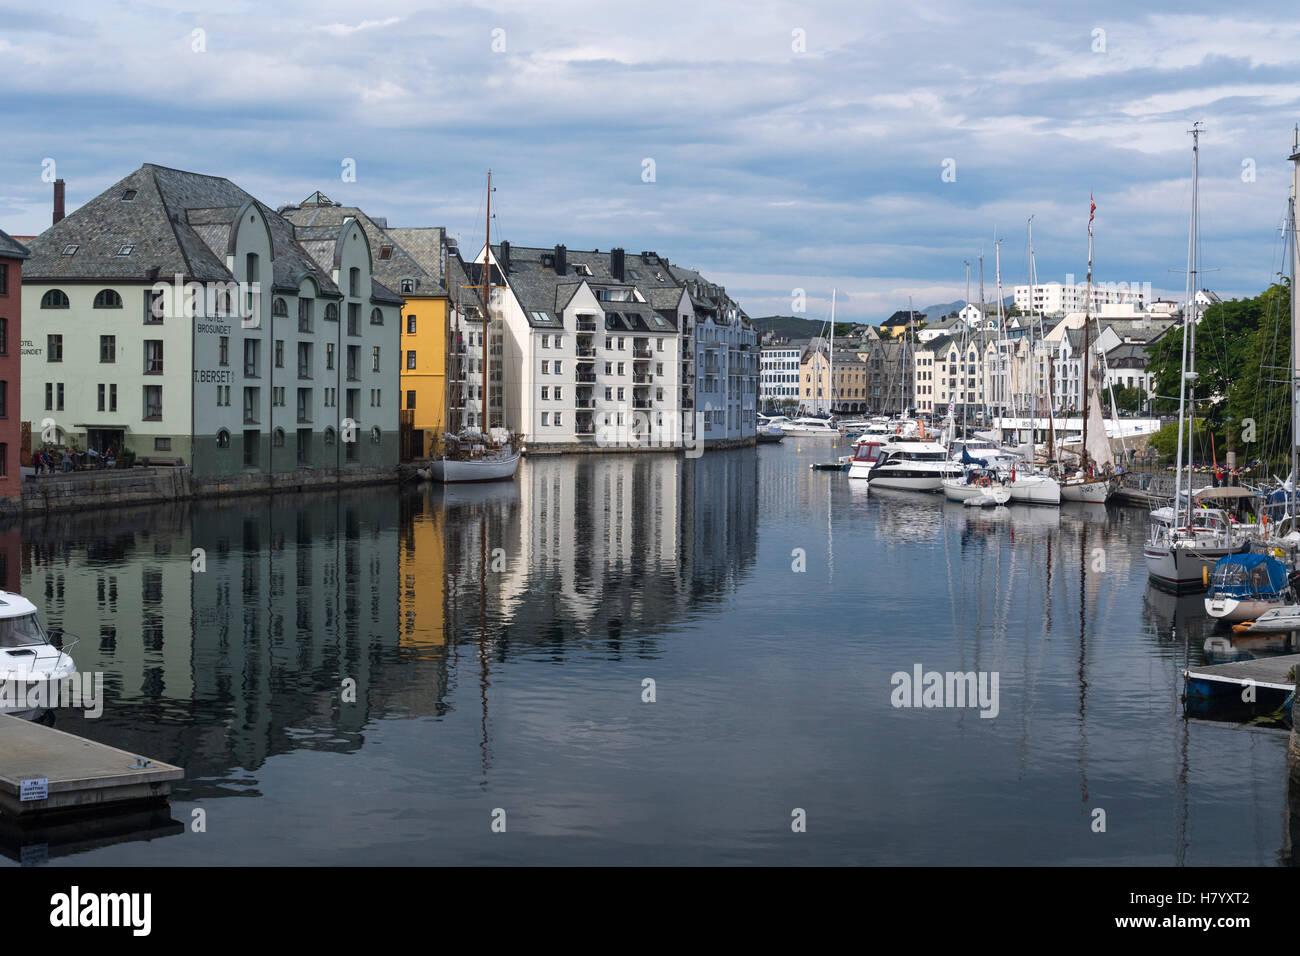 Inner Harbour, Alesund, Møre og Romsdal, Norway - Stock Image